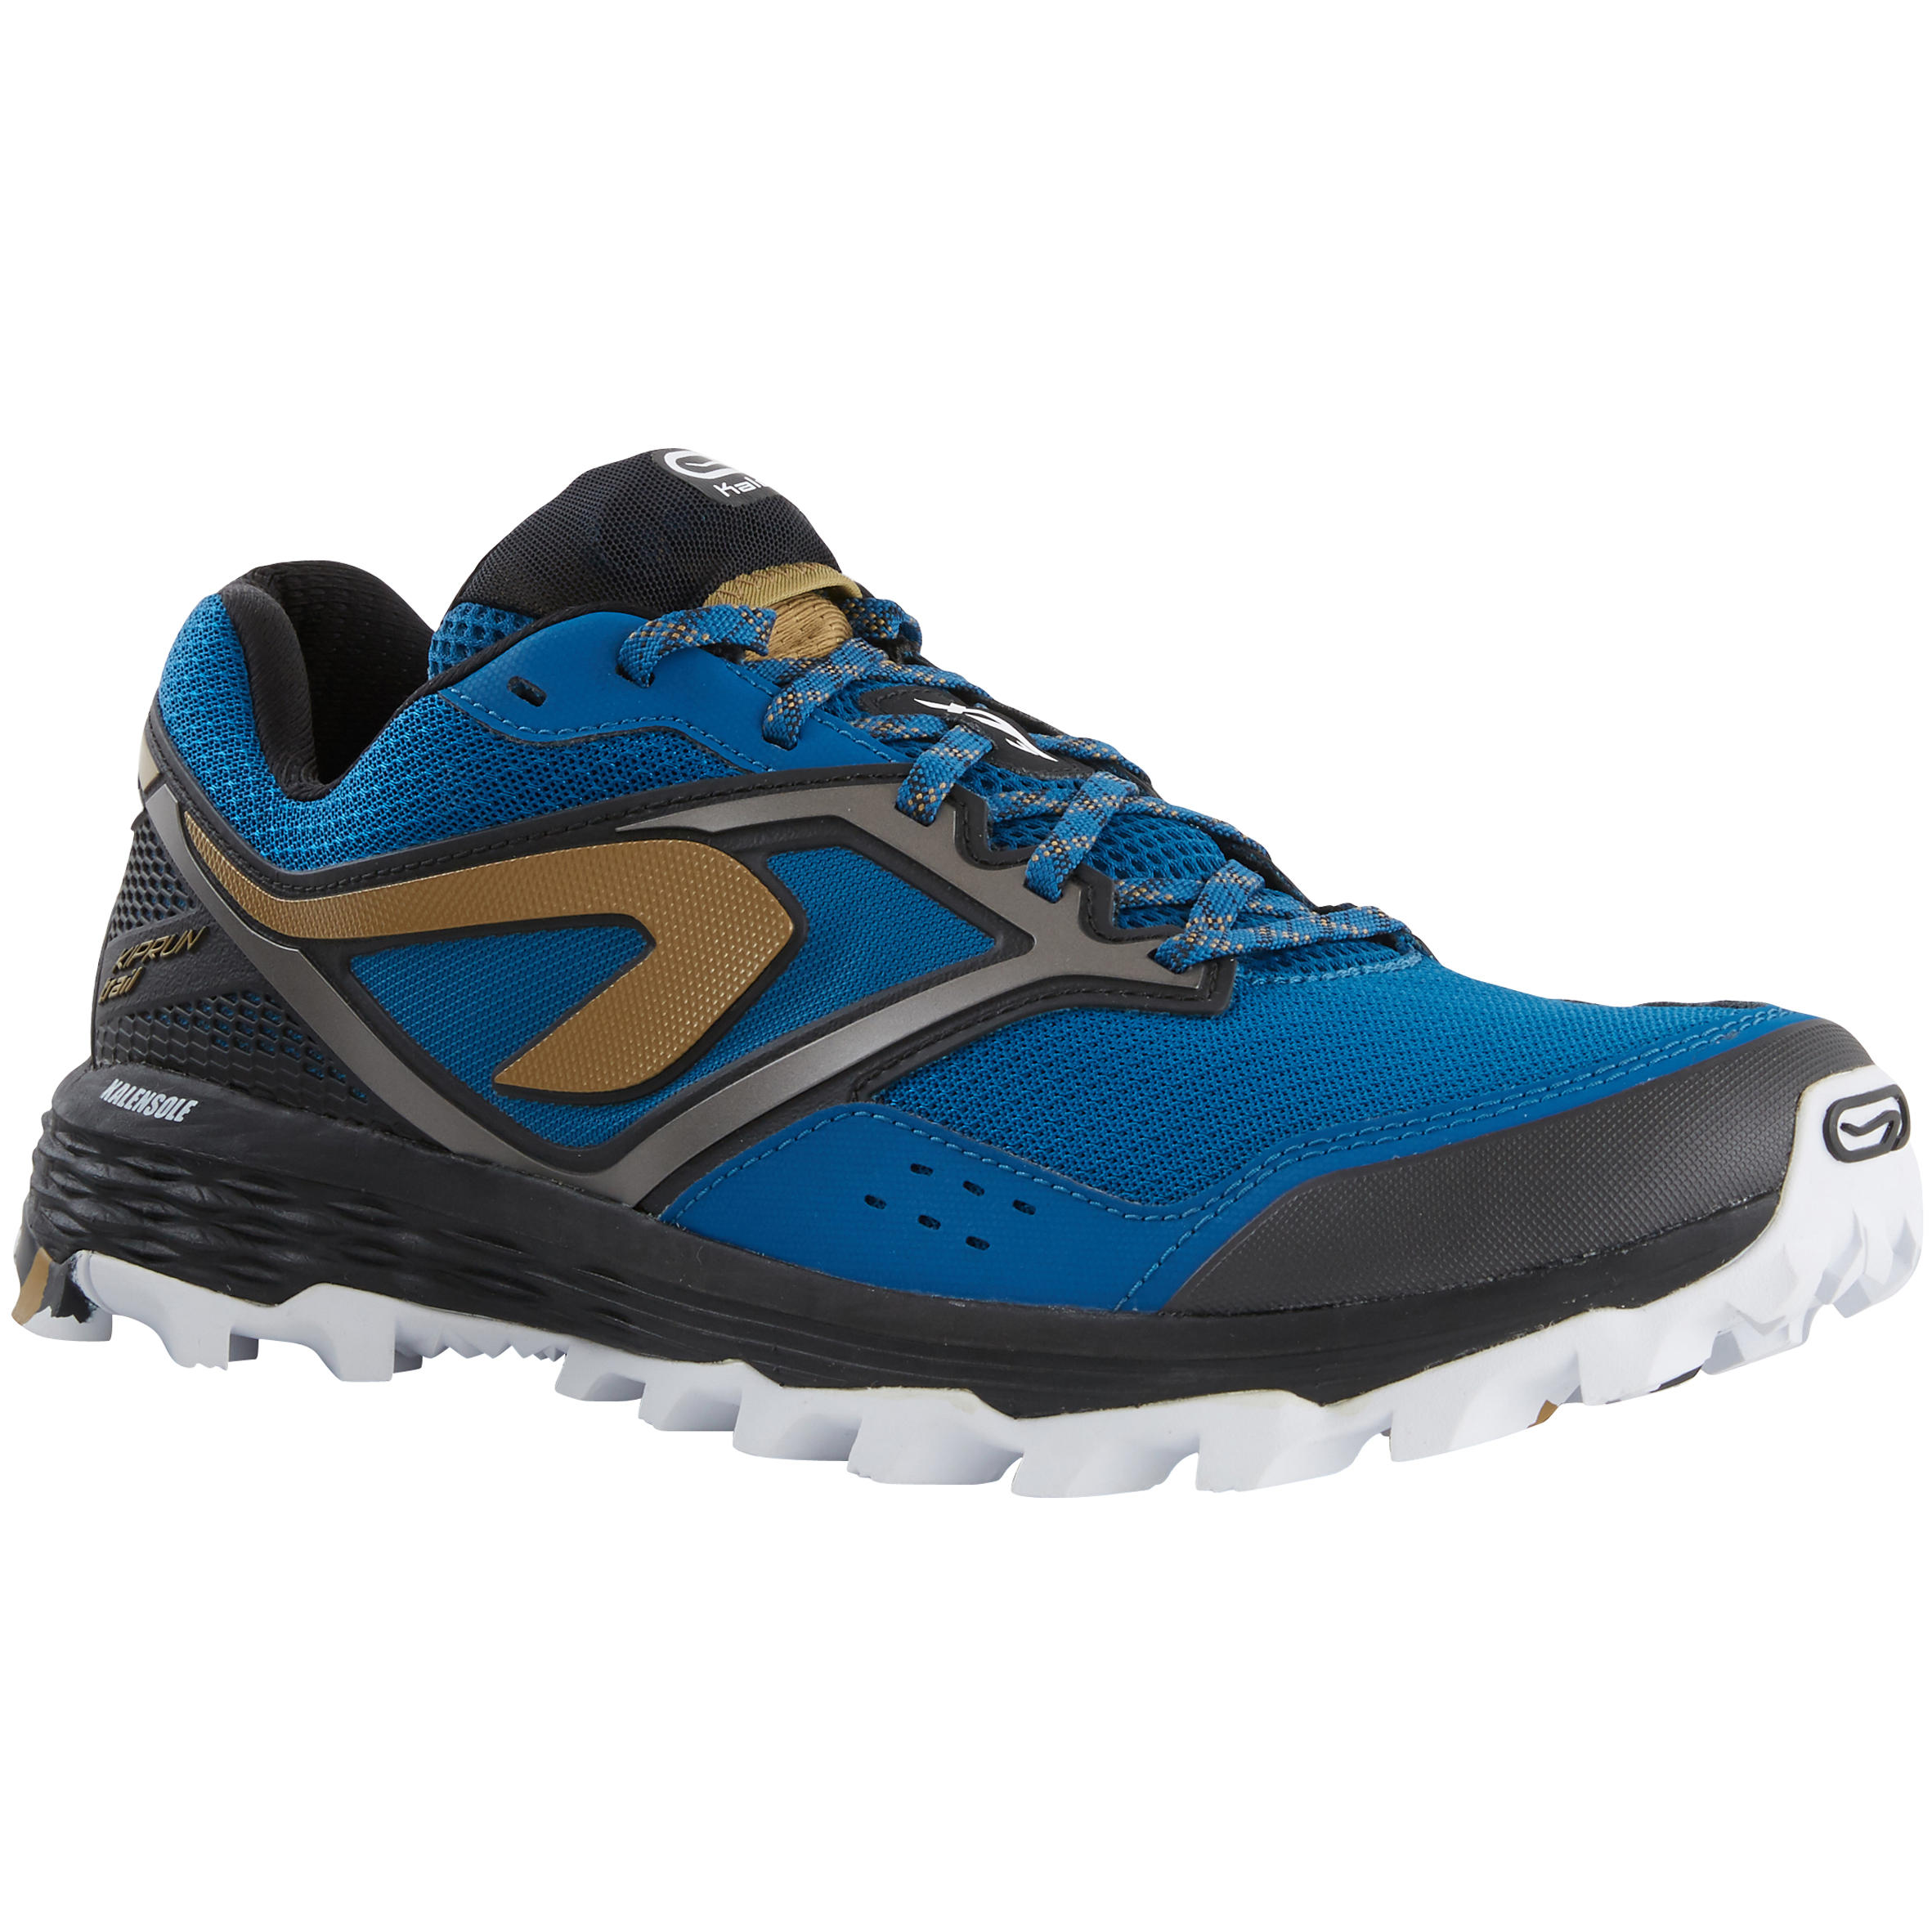 XT7 trail running shoes for men blue